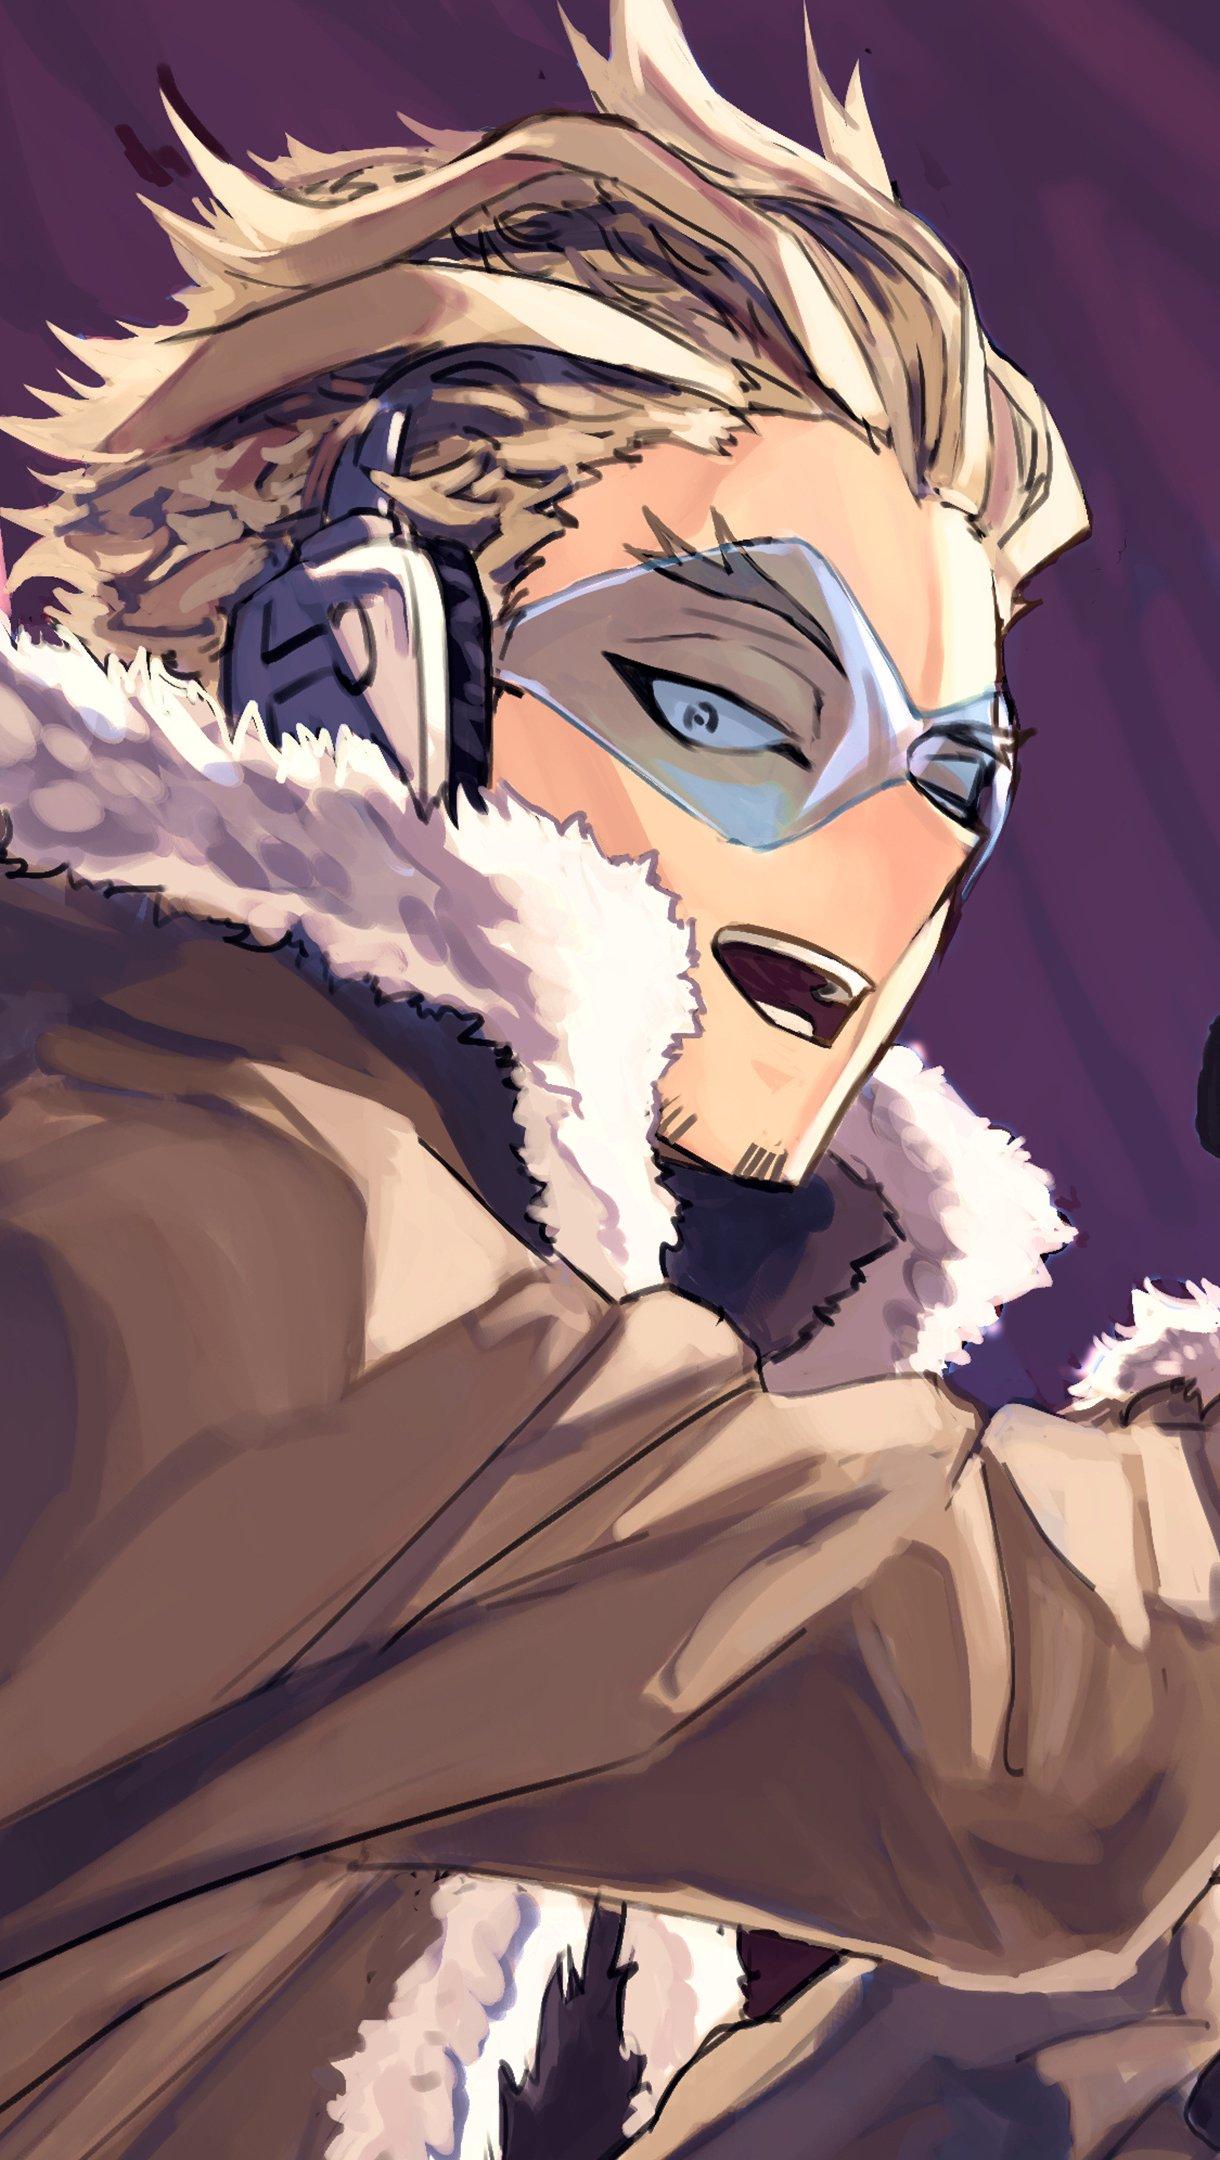 Anime Wallpaper Keigo Takami Hawks from My hero Academy Vertical